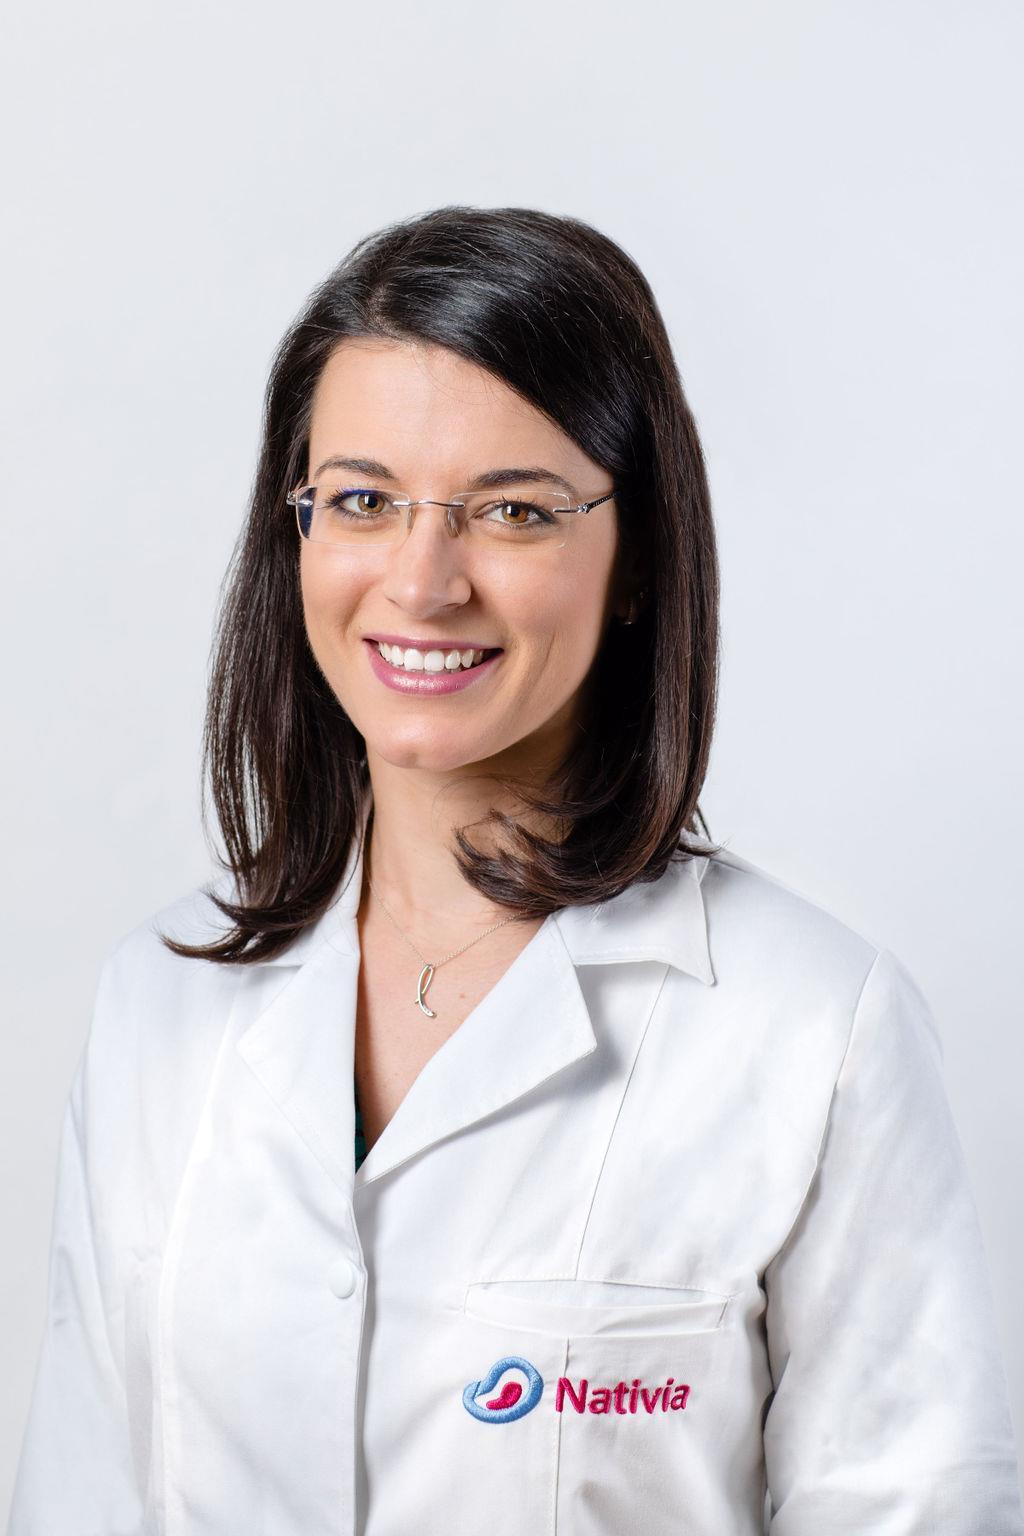 Dr. Laura Mustata